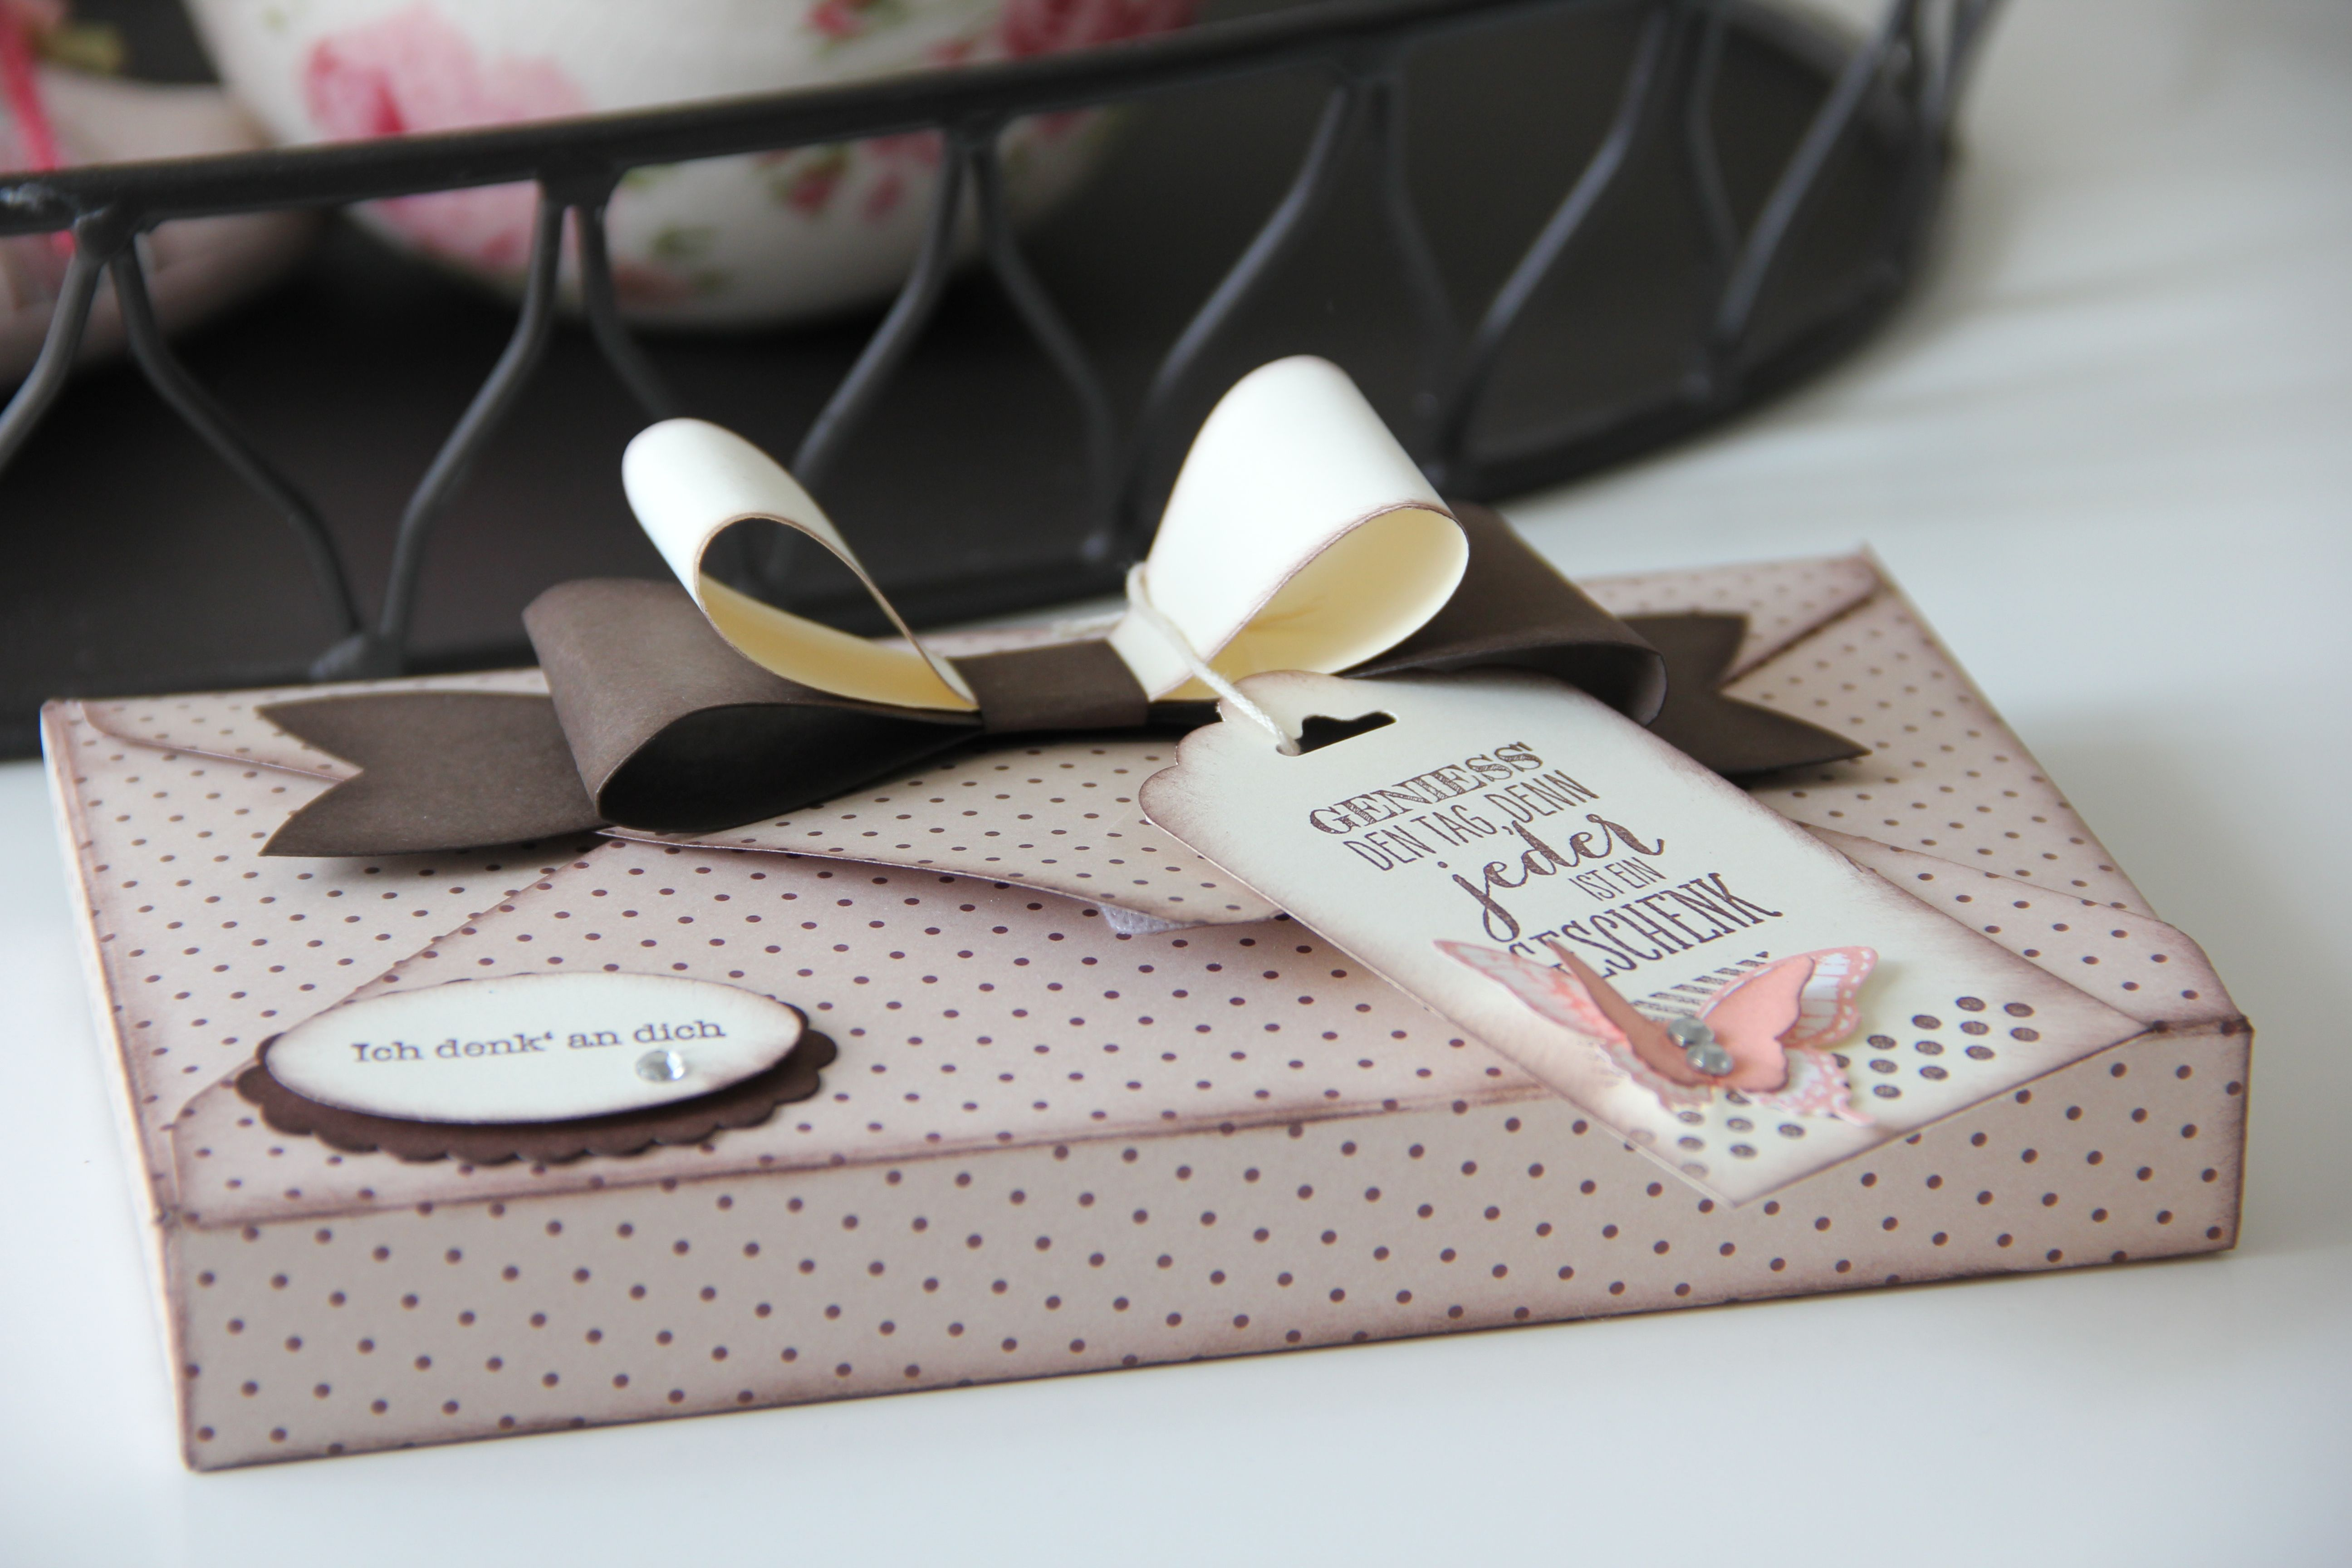 toffifee verpackung kreative lieblingsst cke boxen verpackungen pinterest. Black Bedroom Furniture Sets. Home Design Ideas